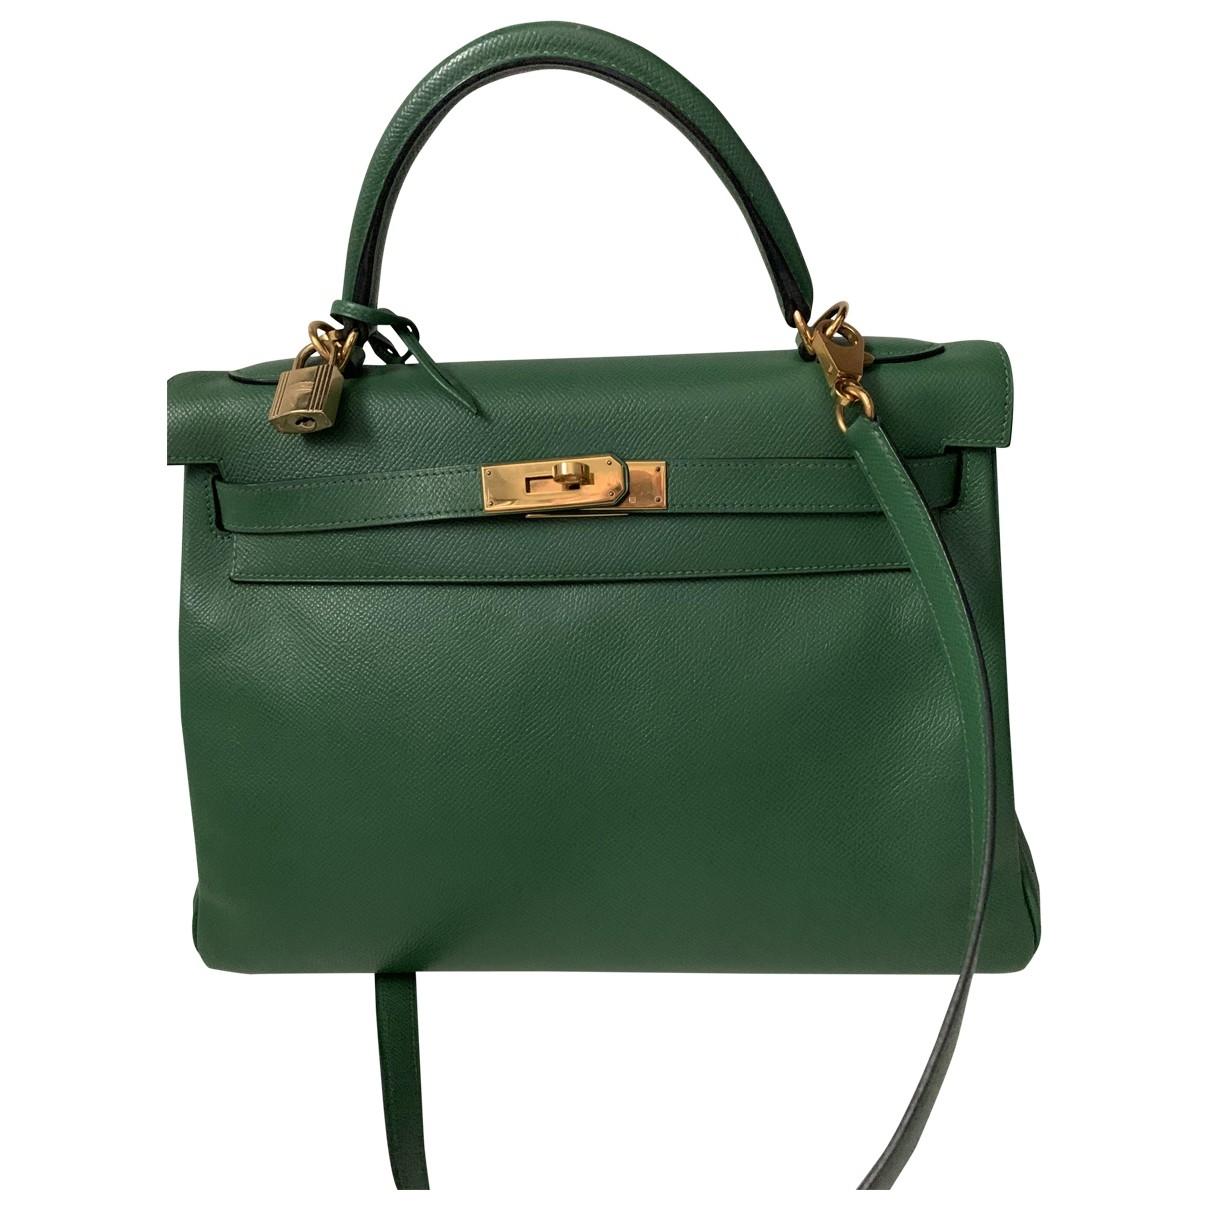 Hermes - Sac a main Kelly 32 pour femme en cuir - vert